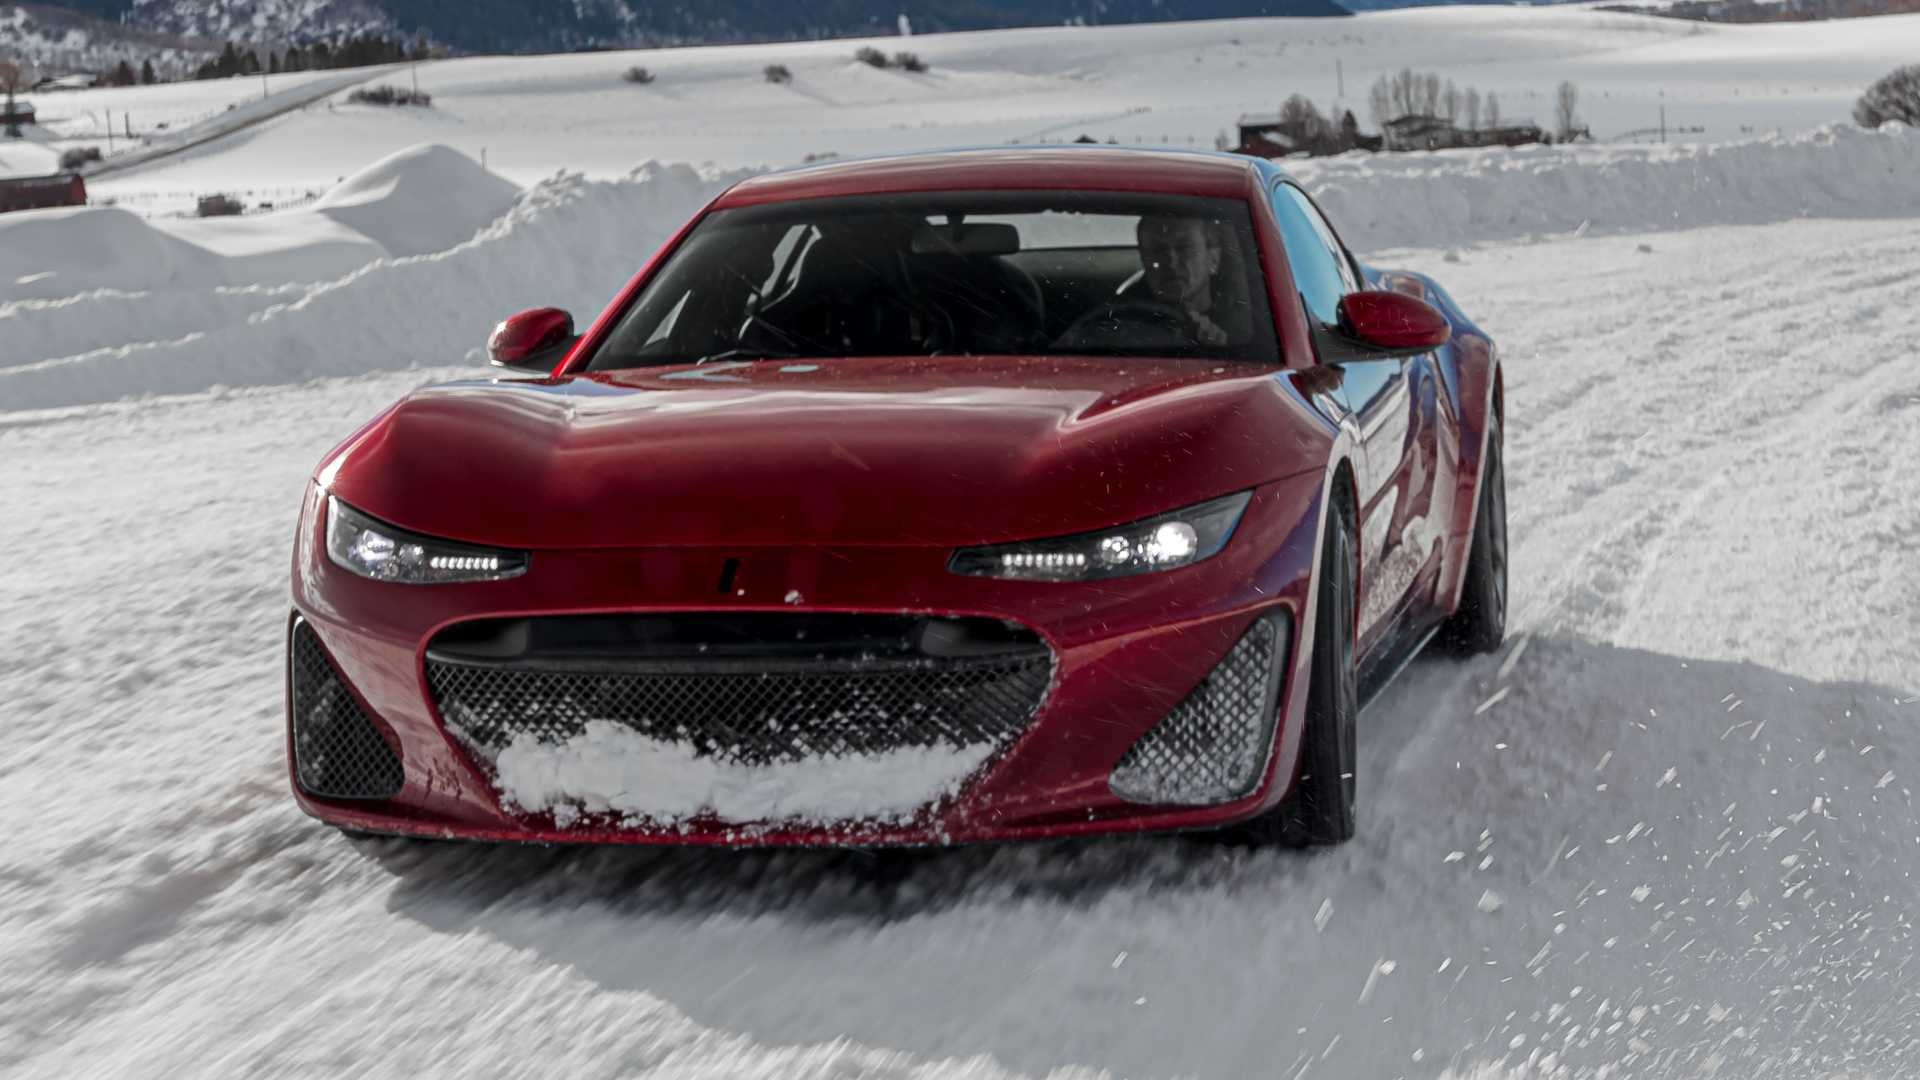 Drako-GTE-Winter-Testing-3